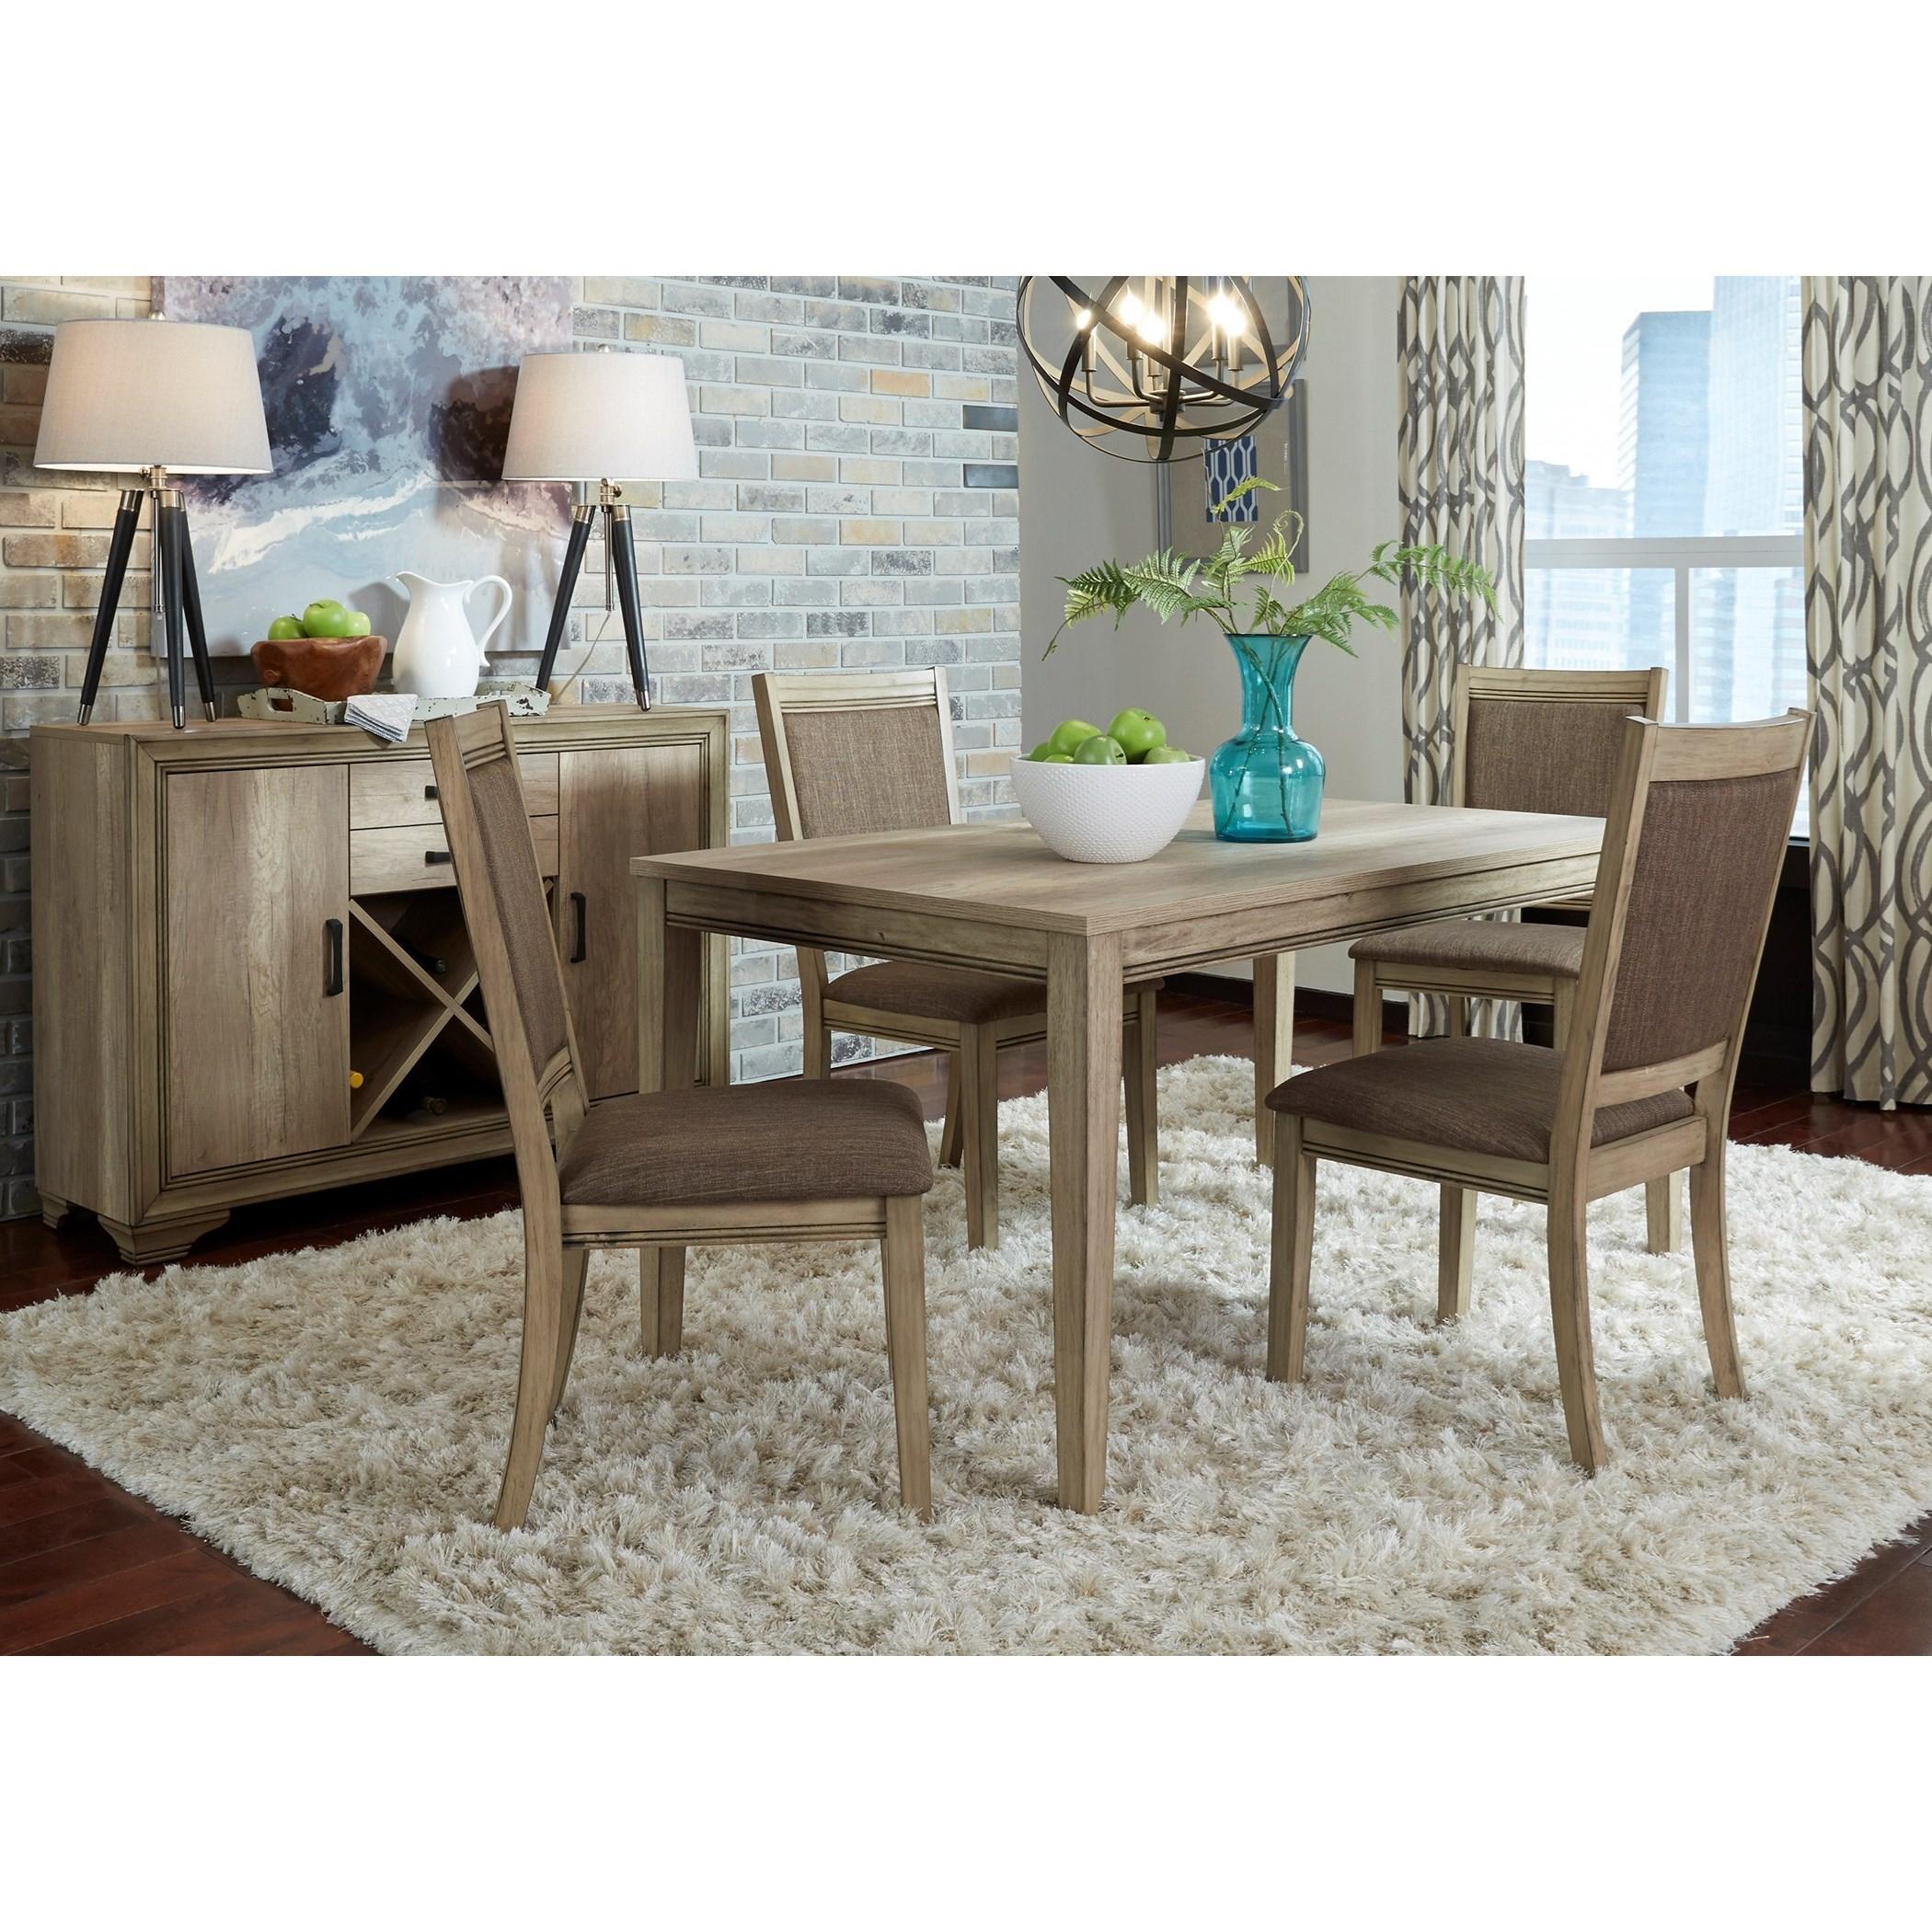 Sun Valley Opt 5 Piece Leg Table Set  by Liberty Furniture at Lapeer Furniture & Mattress Center